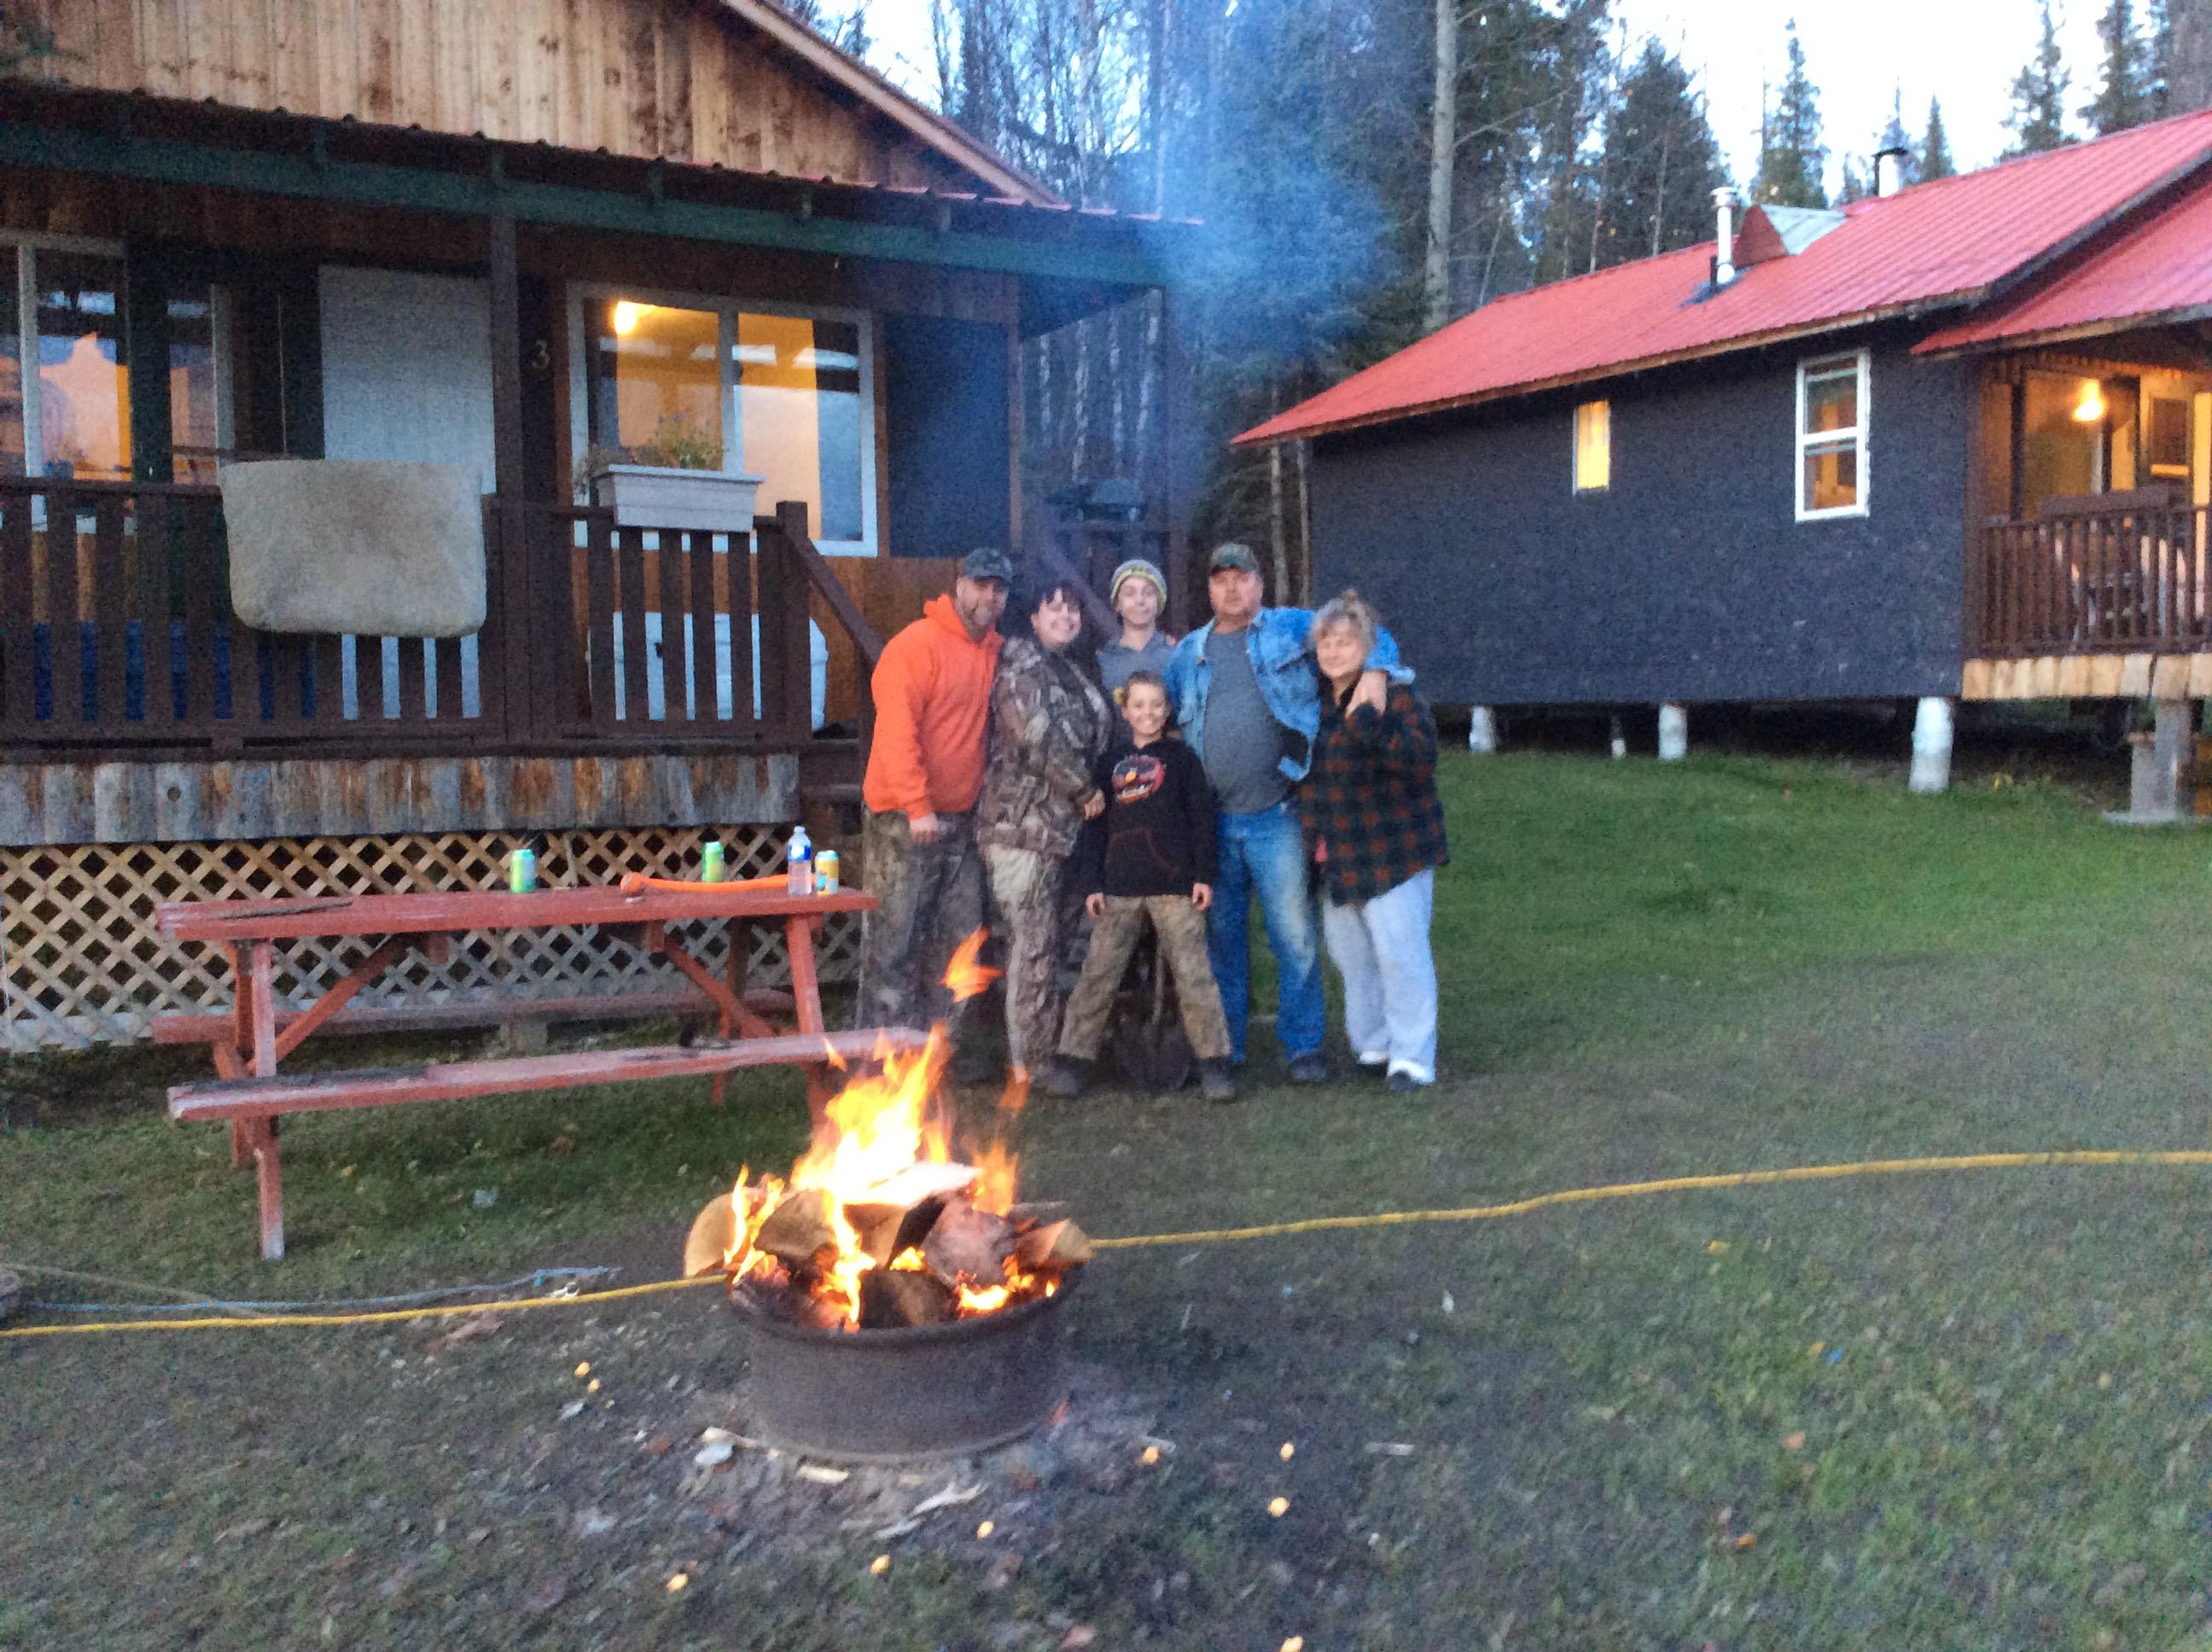 Sven and Cindy's crew